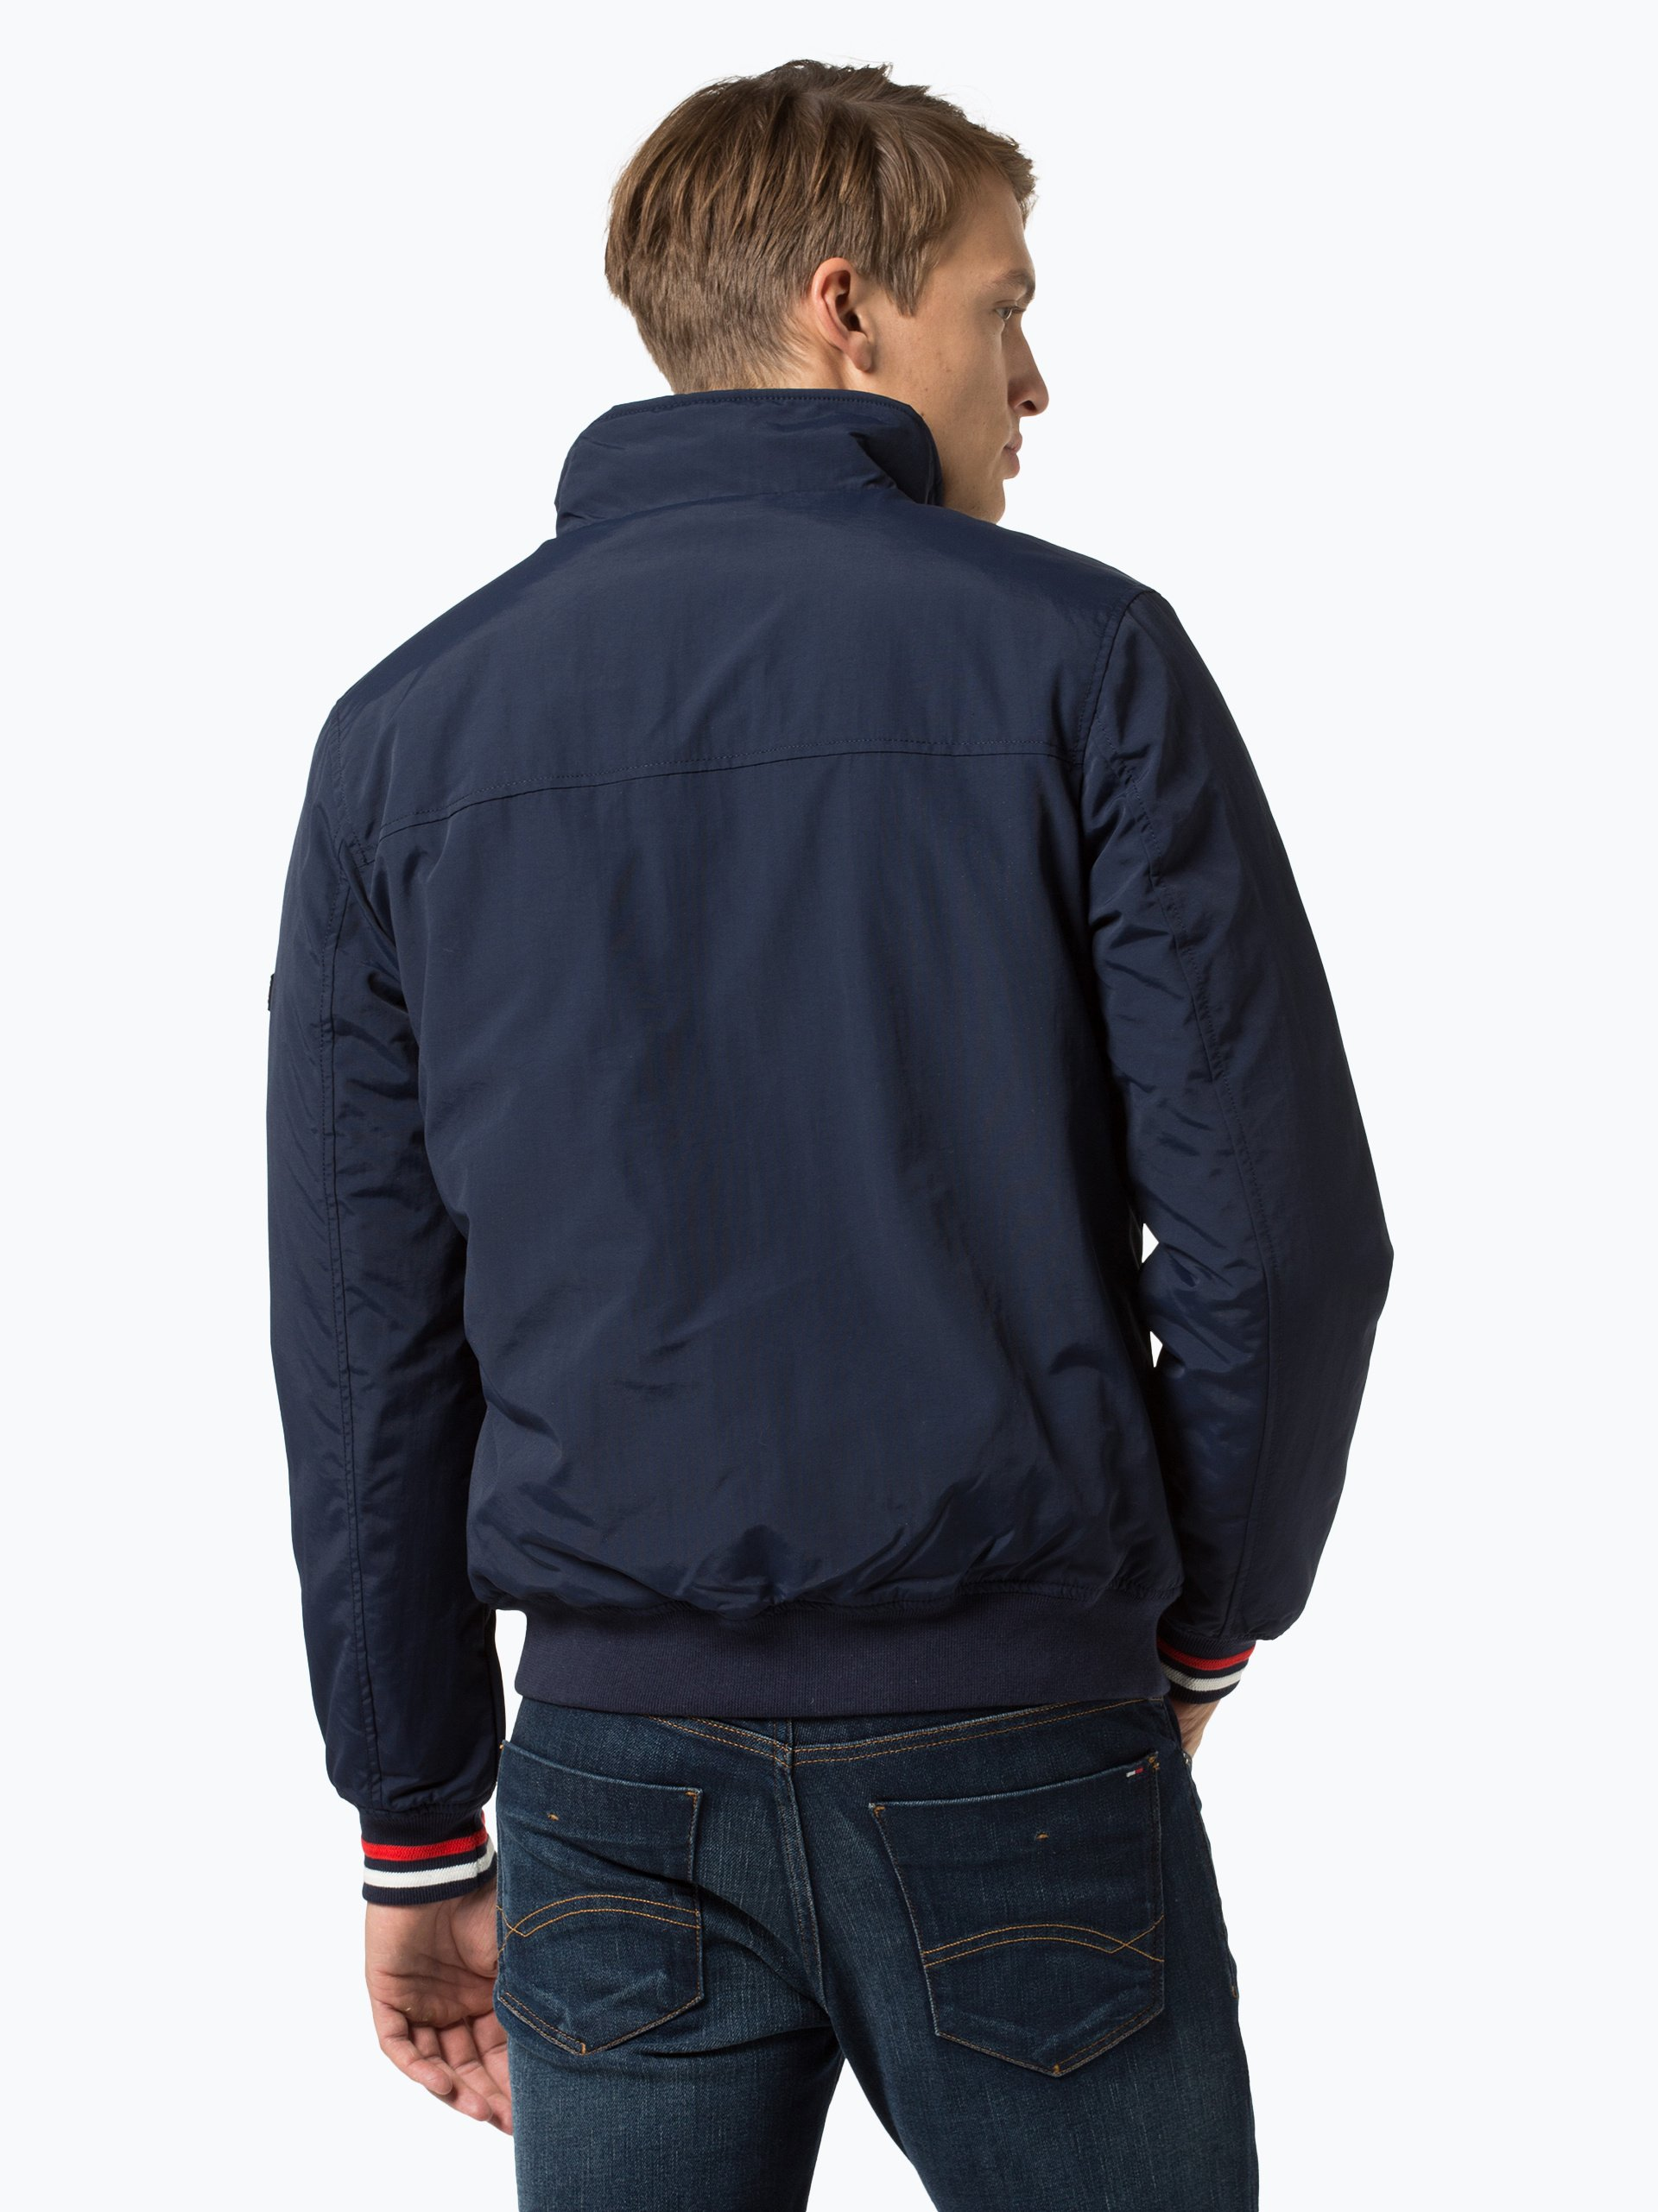 tommy jeans herren jacke marine uni online kaufen peek. Black Bedroom Furniture Sets. Home Design Ideas